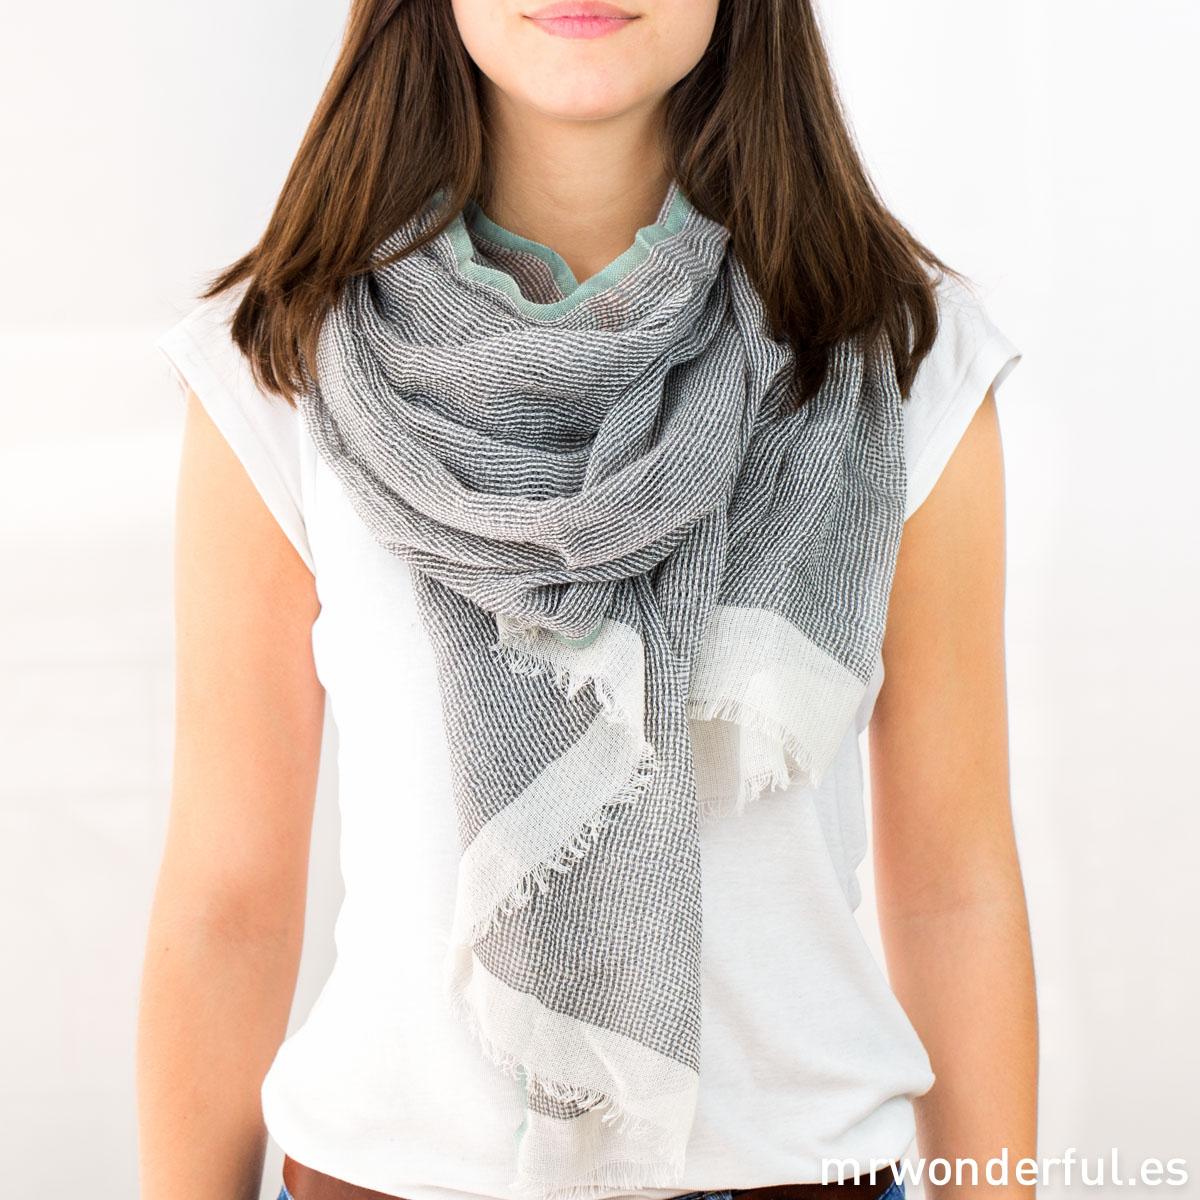 mrwonderful_SA0330_1_foulard-algodon_gris-beige-2